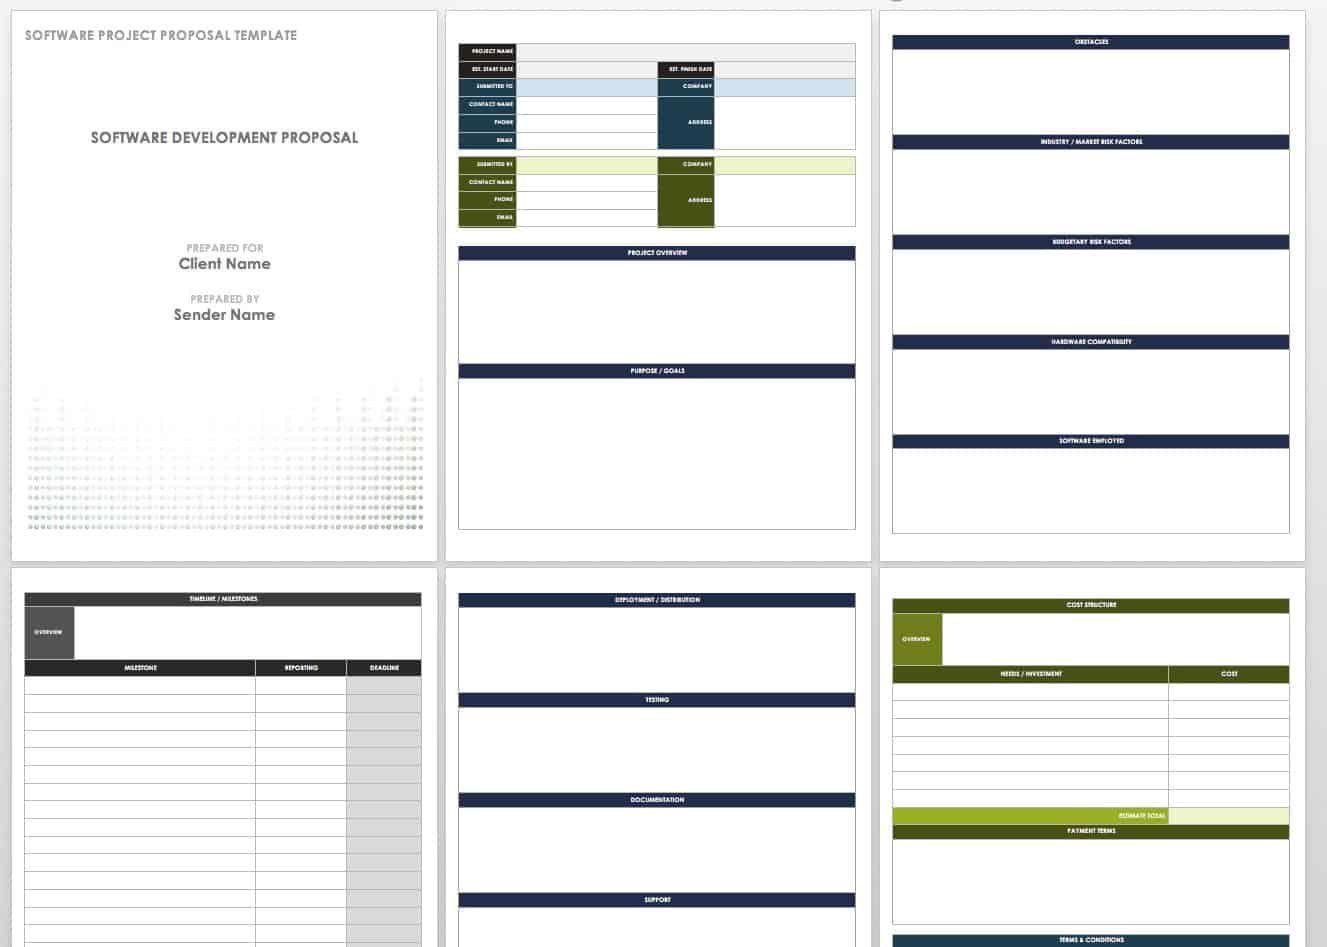 008 Stupendou Web Development Proposal Template Pdf Design  SampleFull